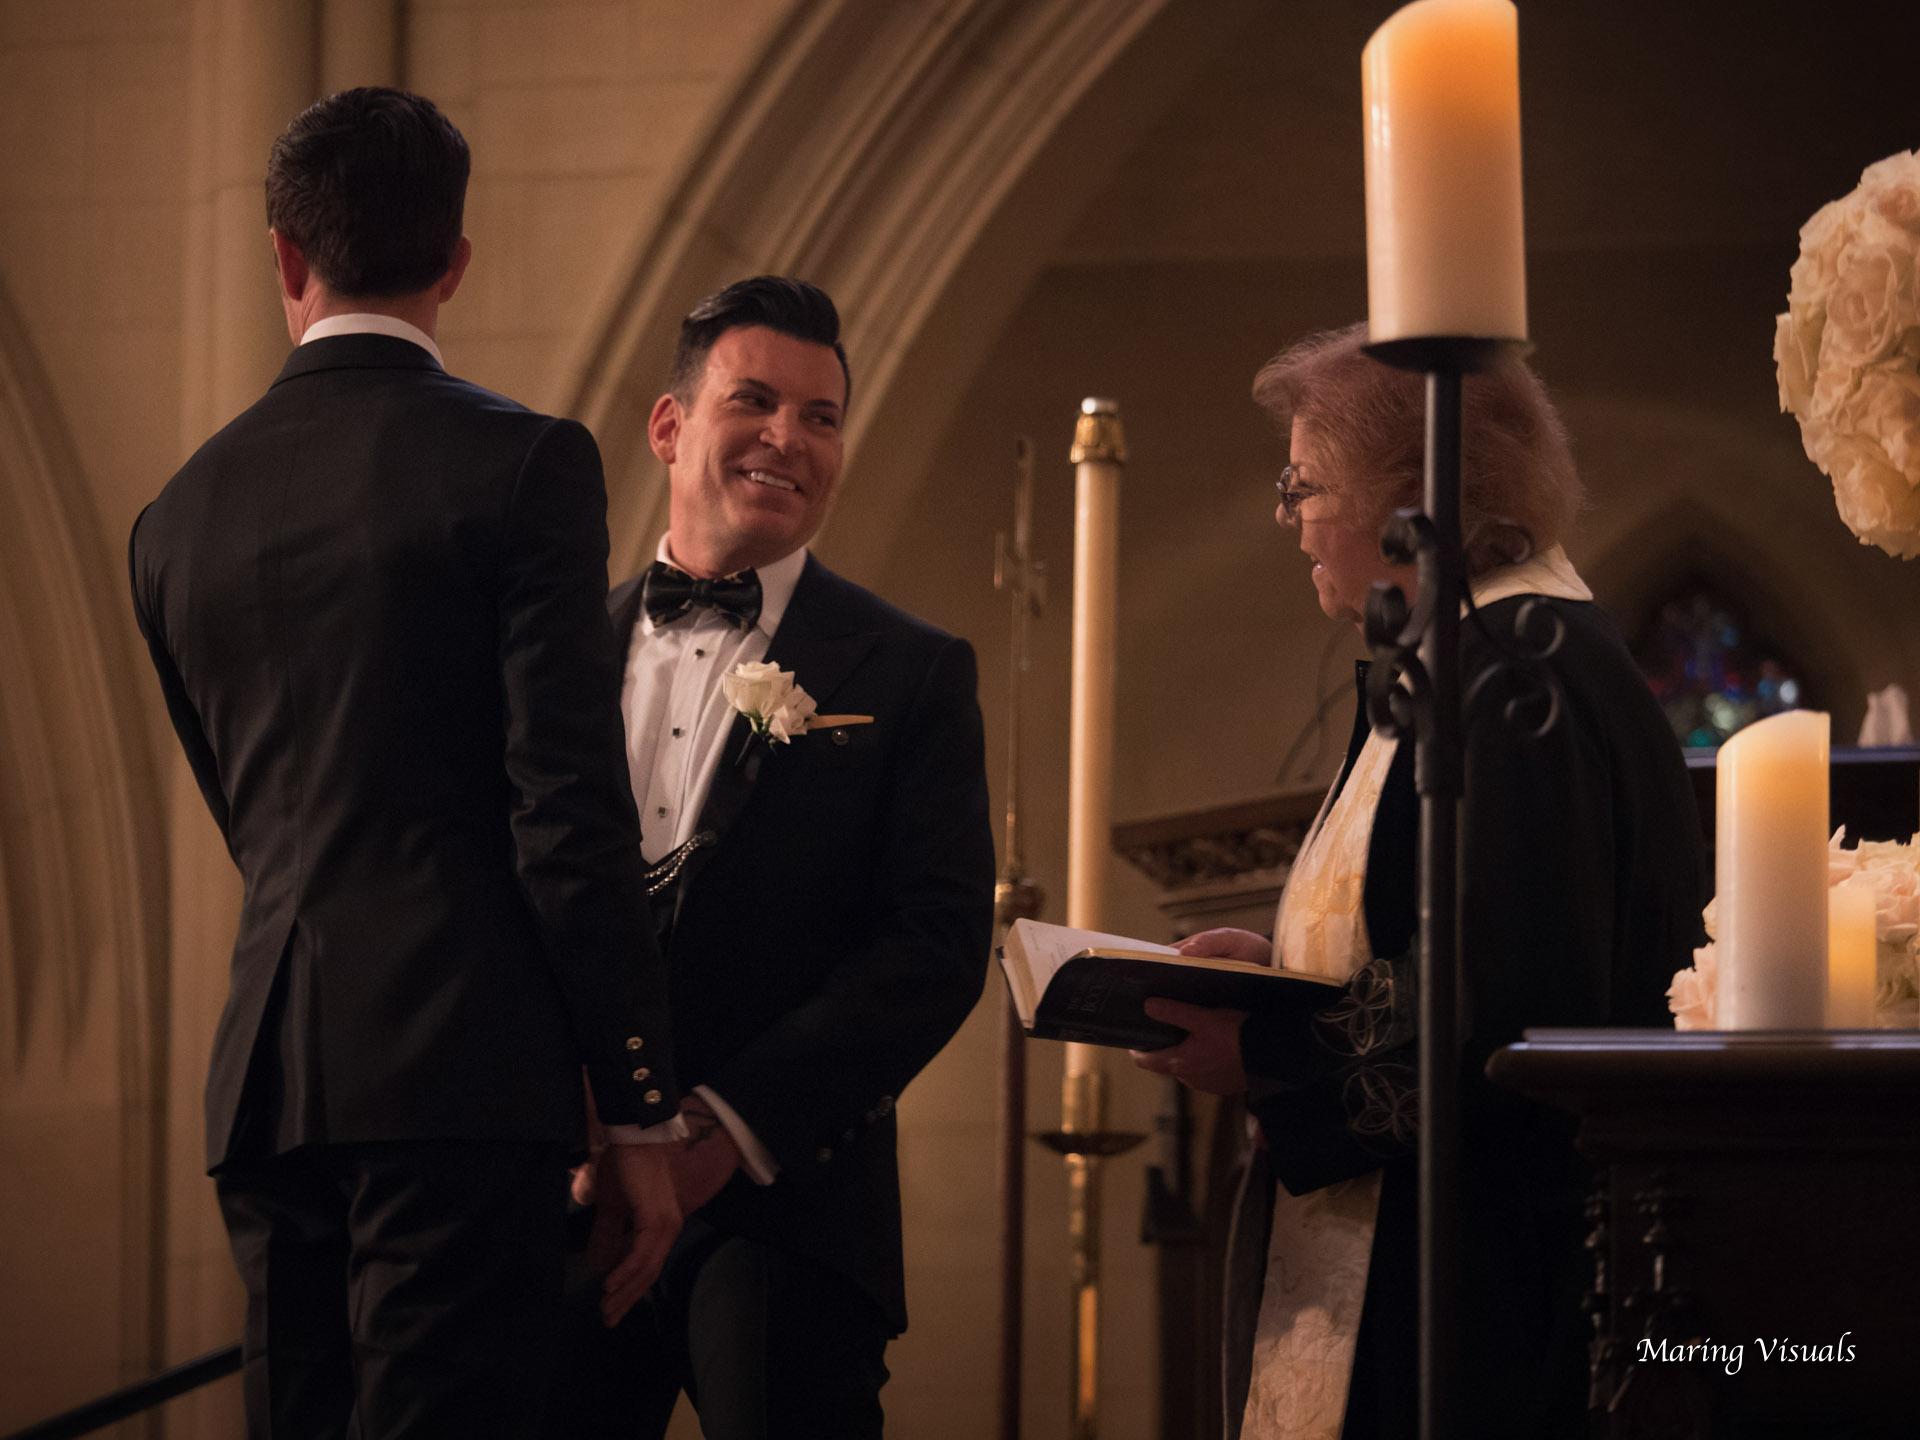 David Tutera Weddings by Maring Visuals 00519.jpg